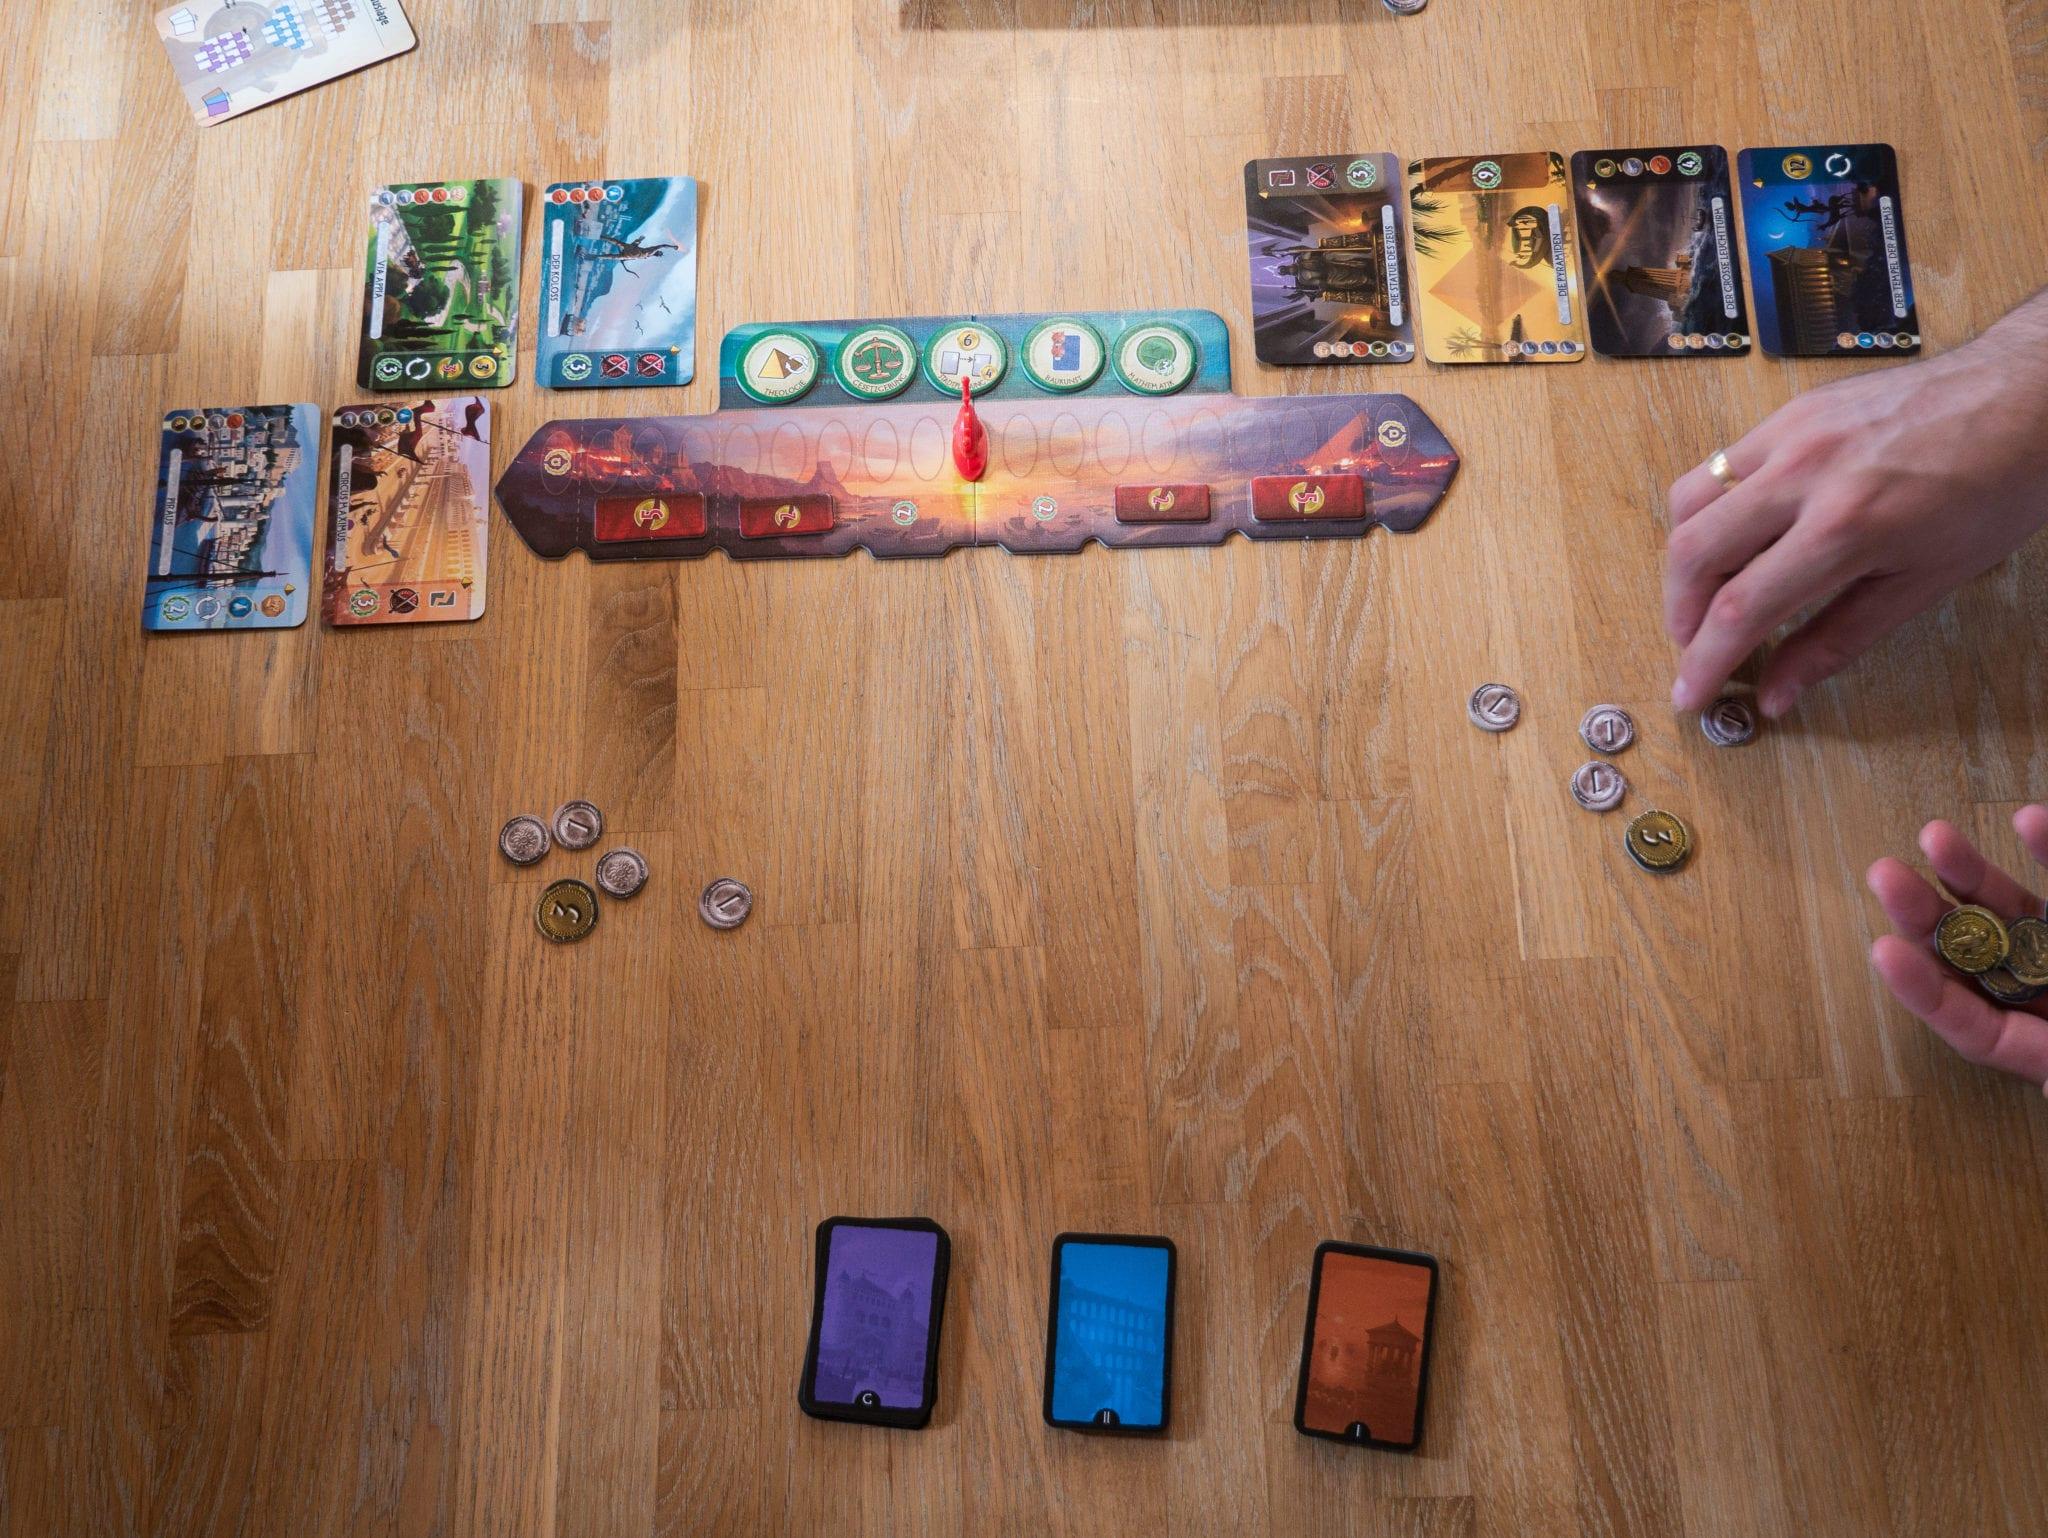 "Vorstellung des Spiels ""7 Wonders Duel"" von Repos Production | familiert.de"